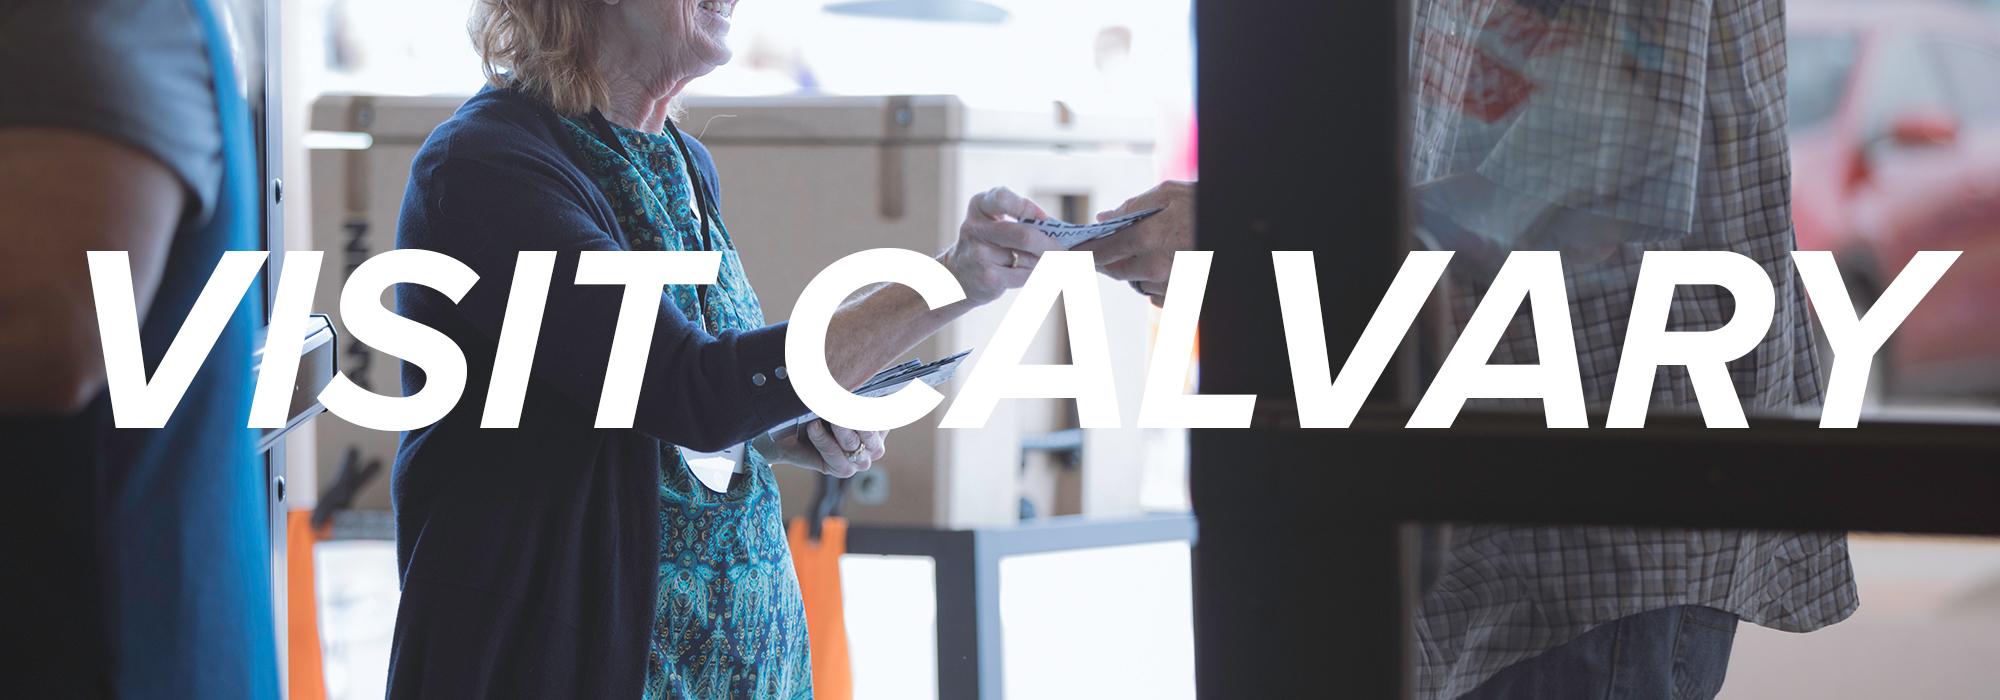 Visit Calvary.jpg